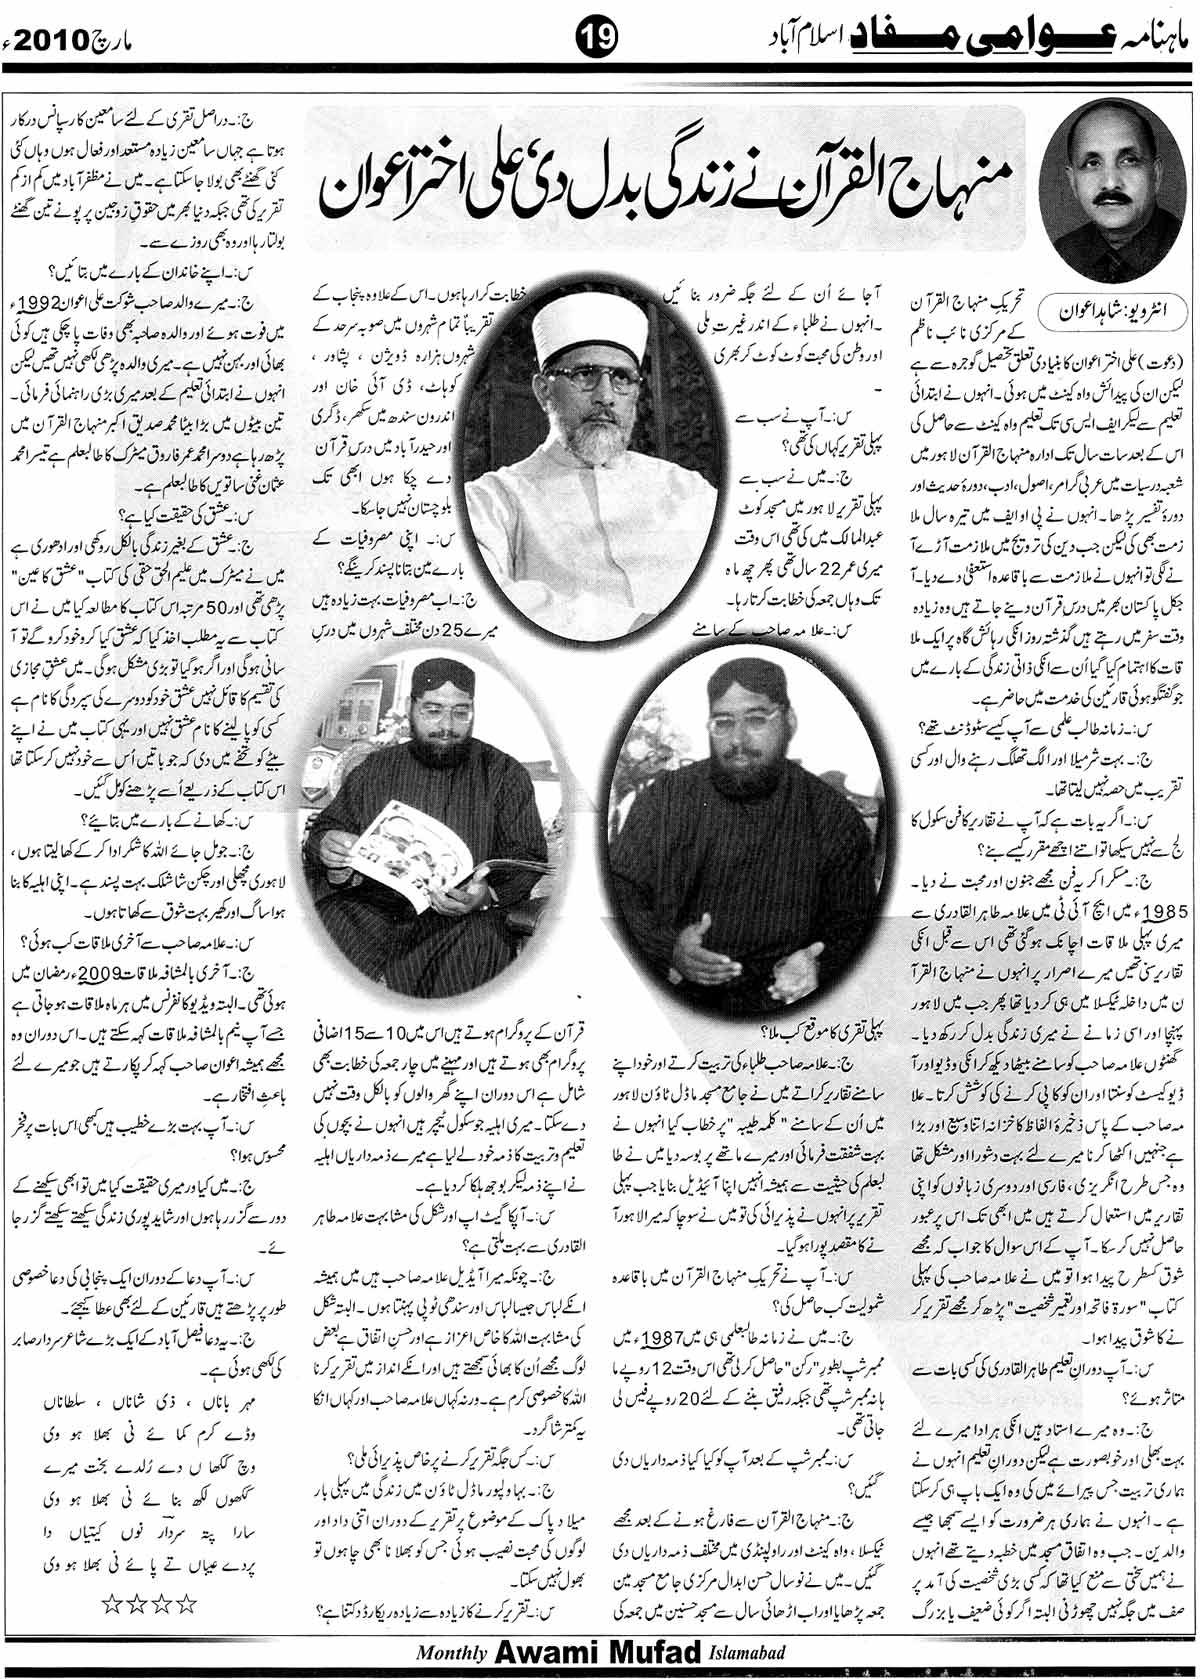 Minhaj-ul-Quran  Print Media Coverage Monthly Awami Mufad Islamabad Page: 19